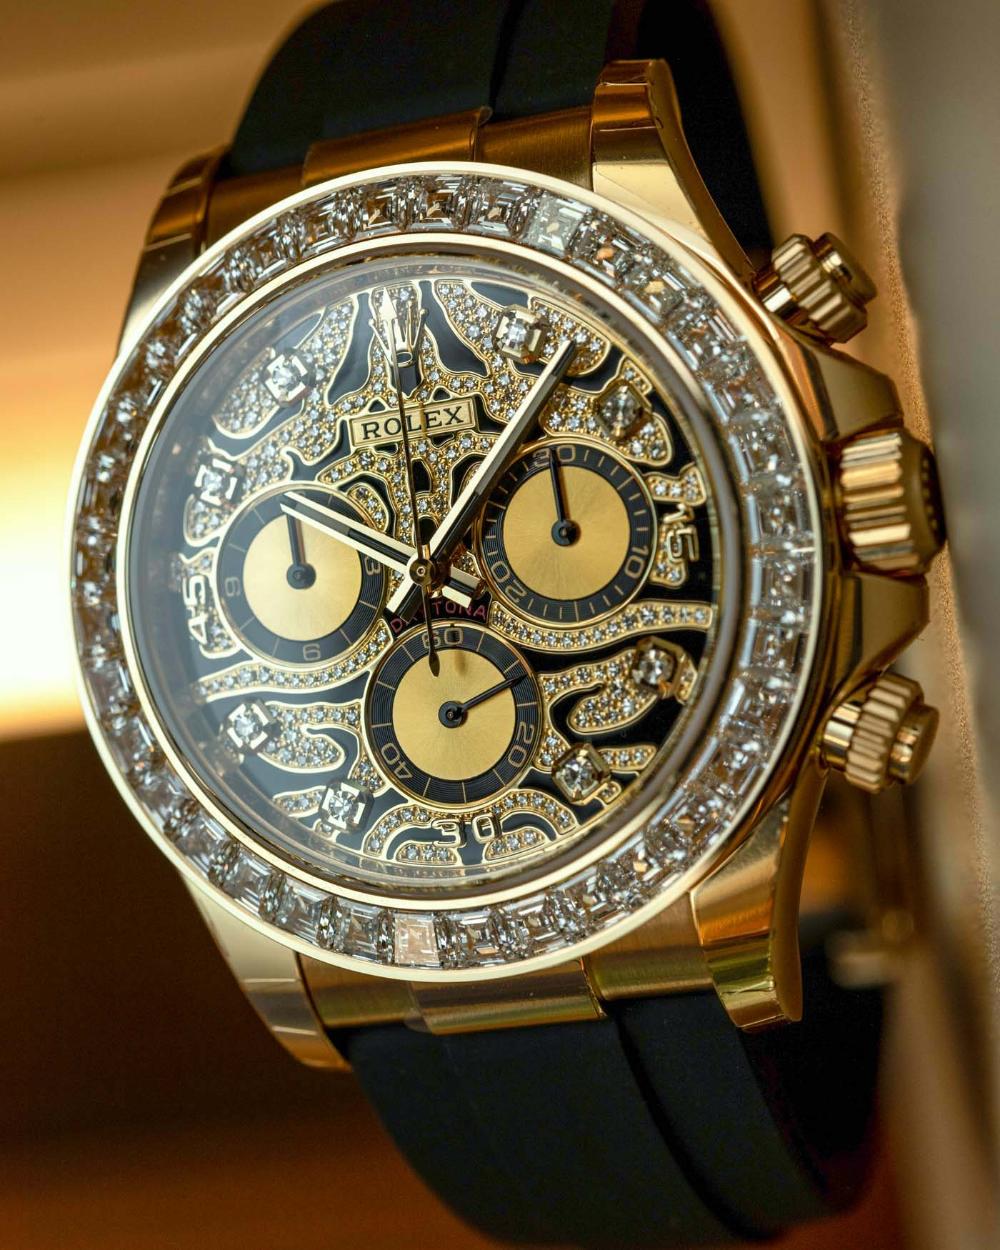 Hands-On: Rolex Daytona 116588TBR 'Eye Of The Tiger' Or 'Rorschach Test' Diamond Set Watch | aBlogtoWatch